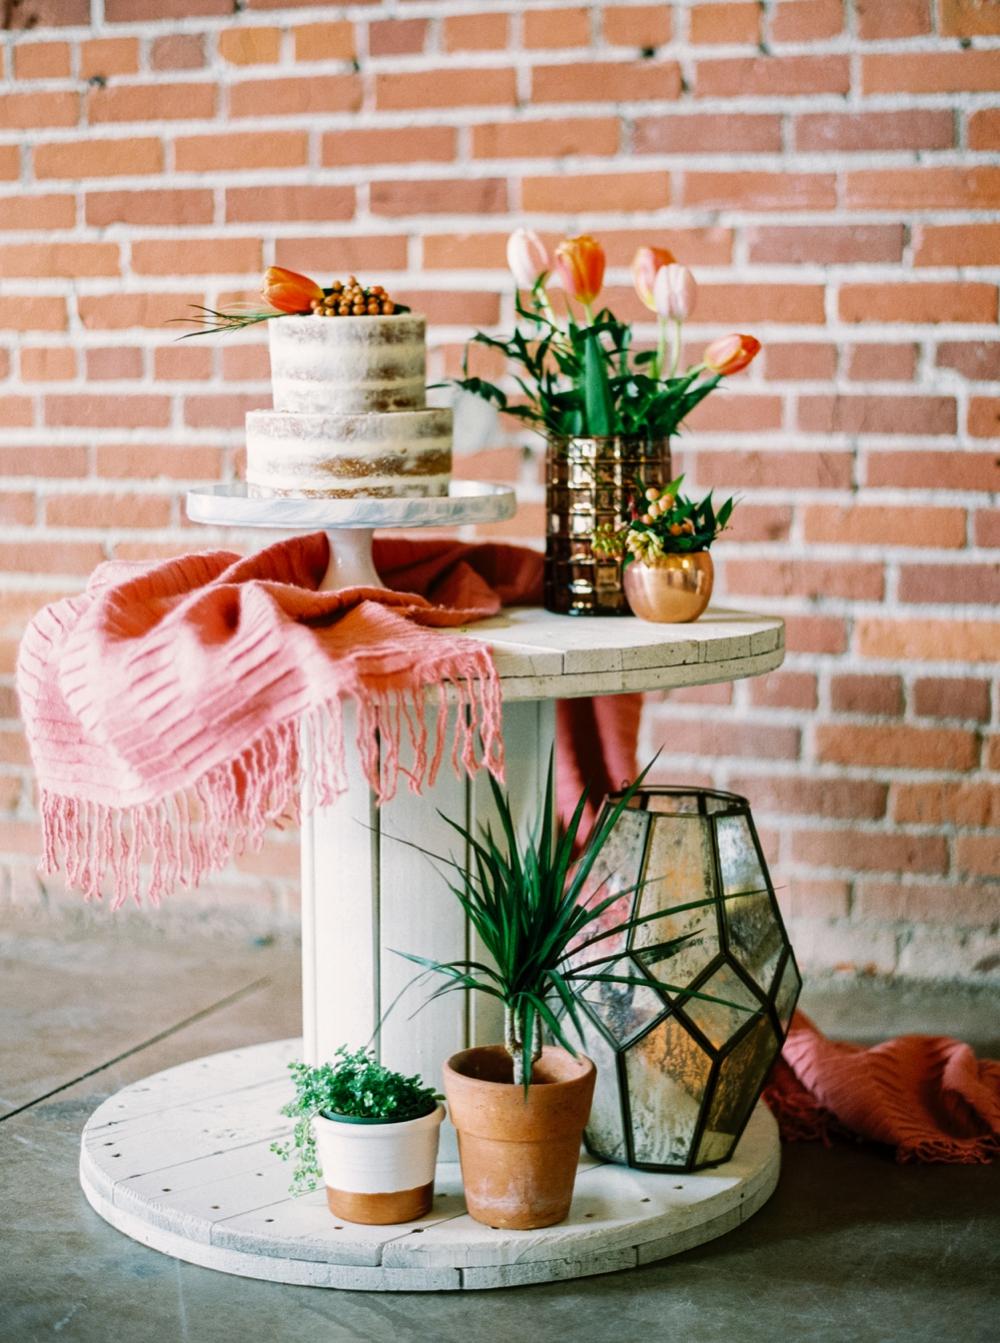 Calgary wedding photographers | The Commons Wedding Calgary | Commons YYC | Brick natural light wedding venue